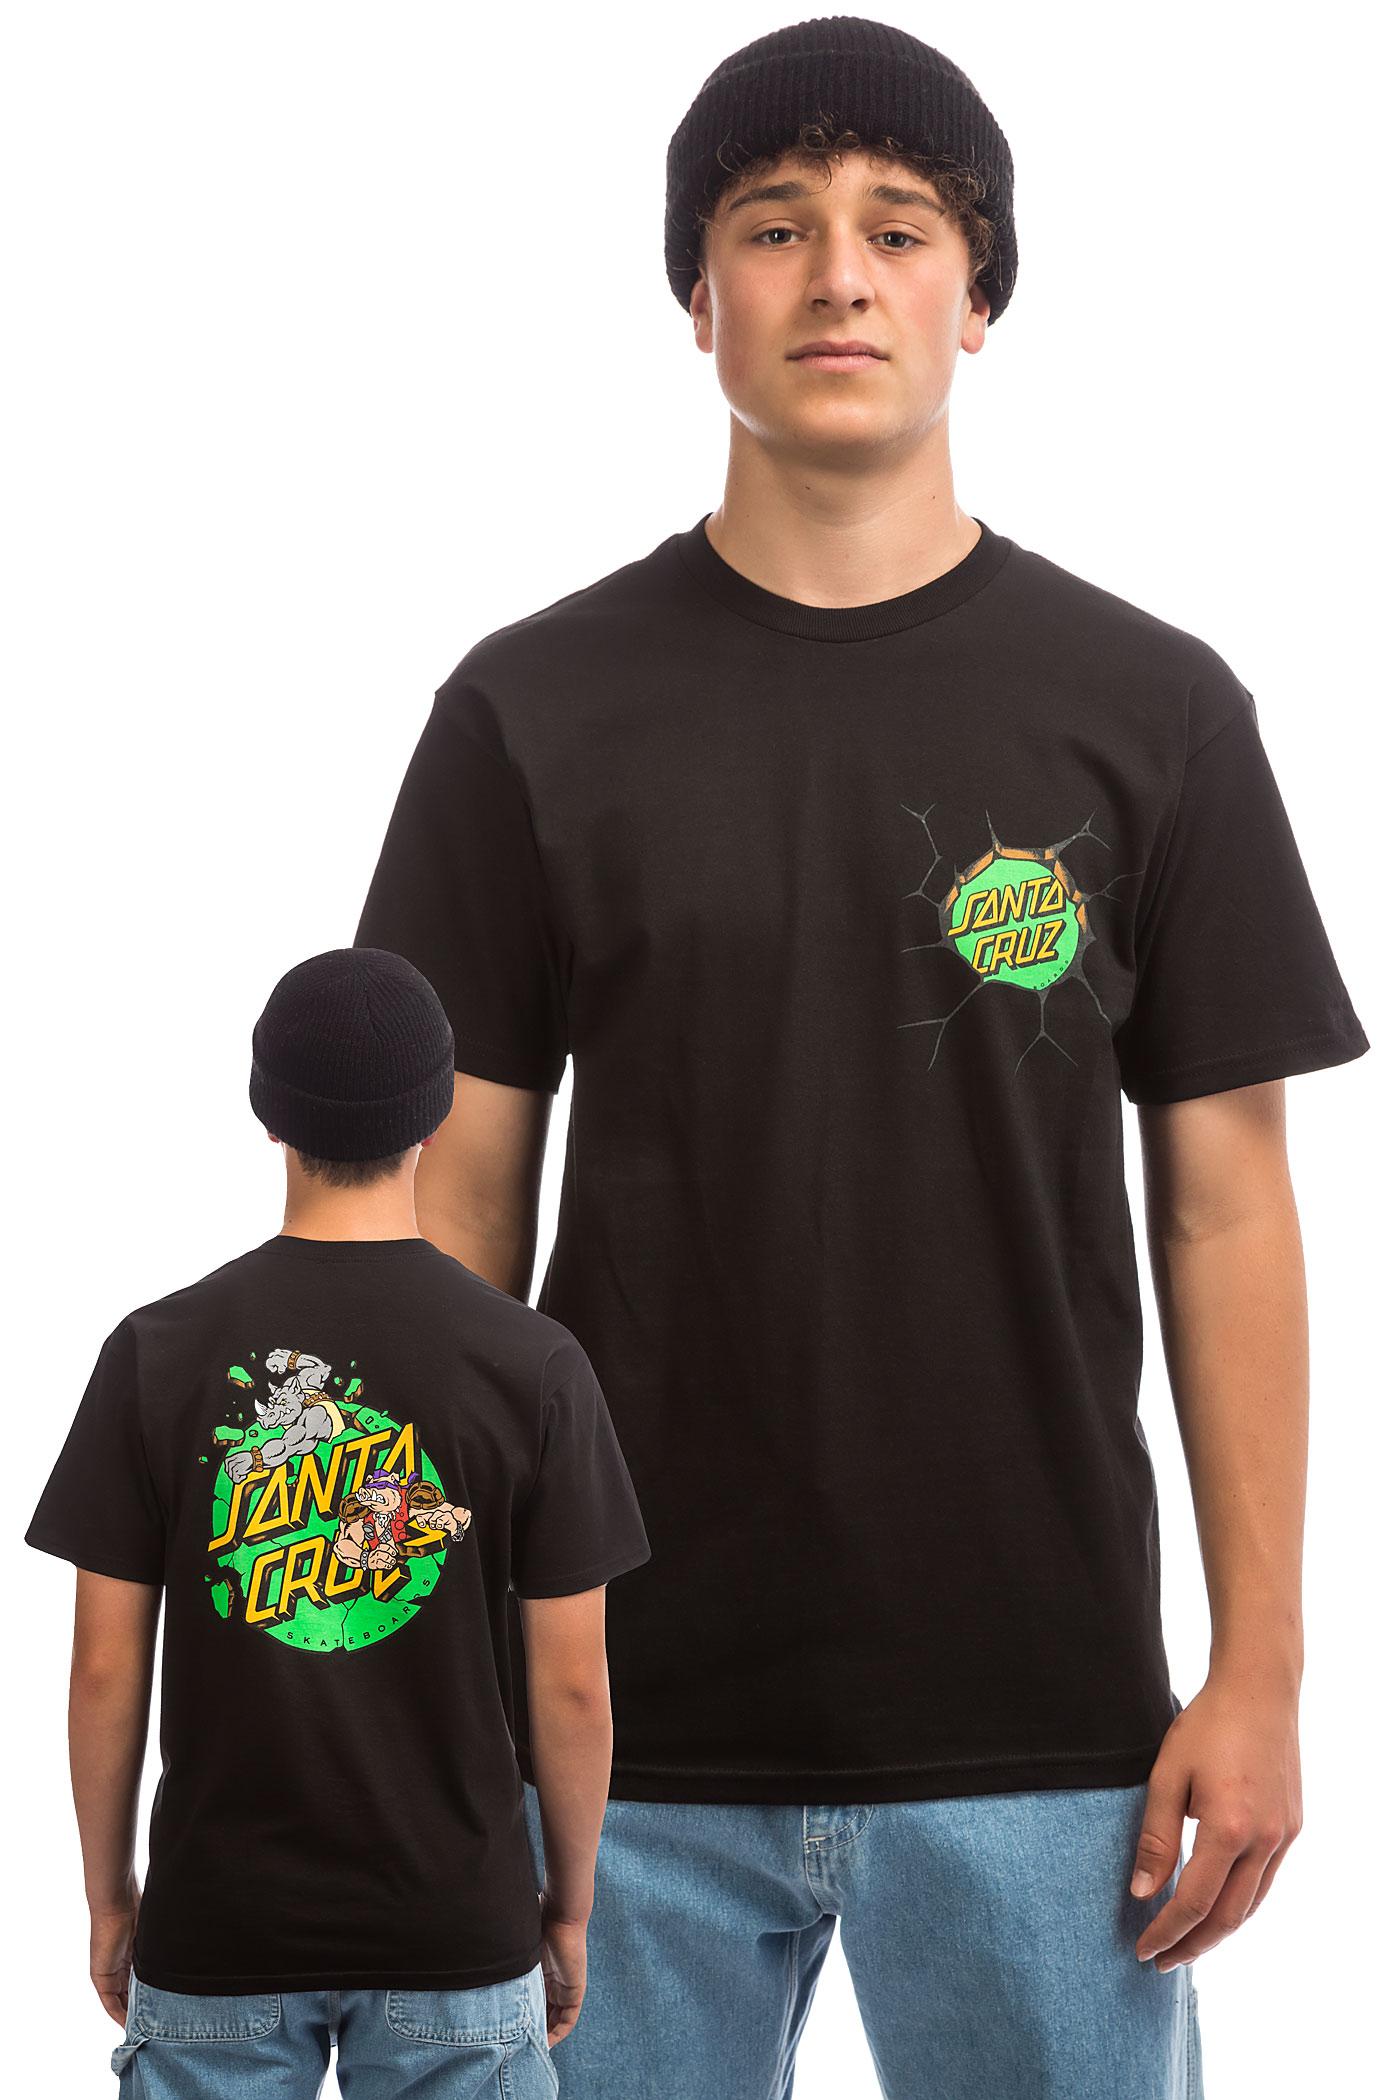 shirtblack Santa Cruz X Tmnt T And Bebop Rocksteady EDI2WH9